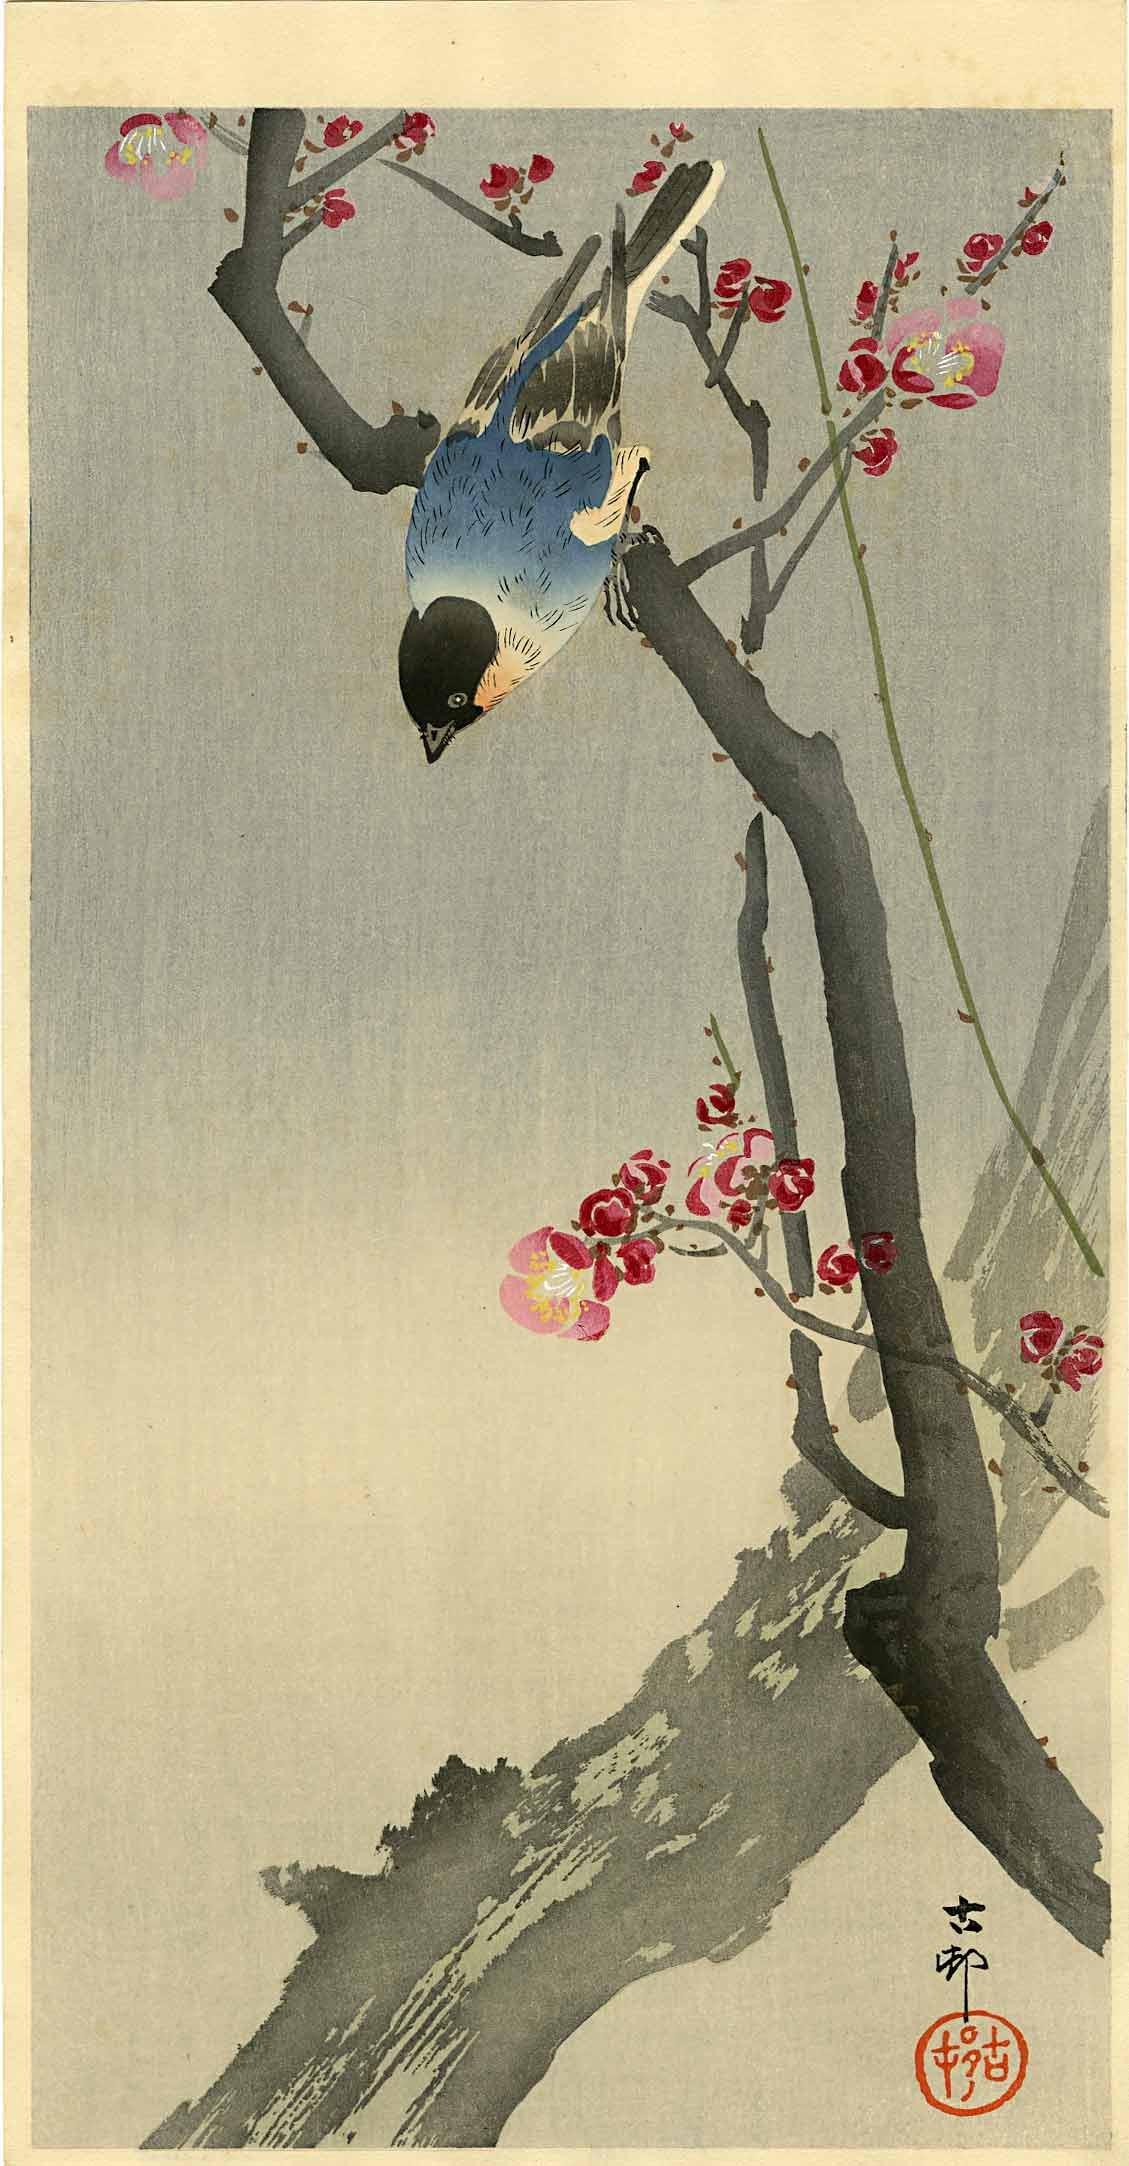 Koson Ohara: Blue Bird on a Plum 1920s Woodblock